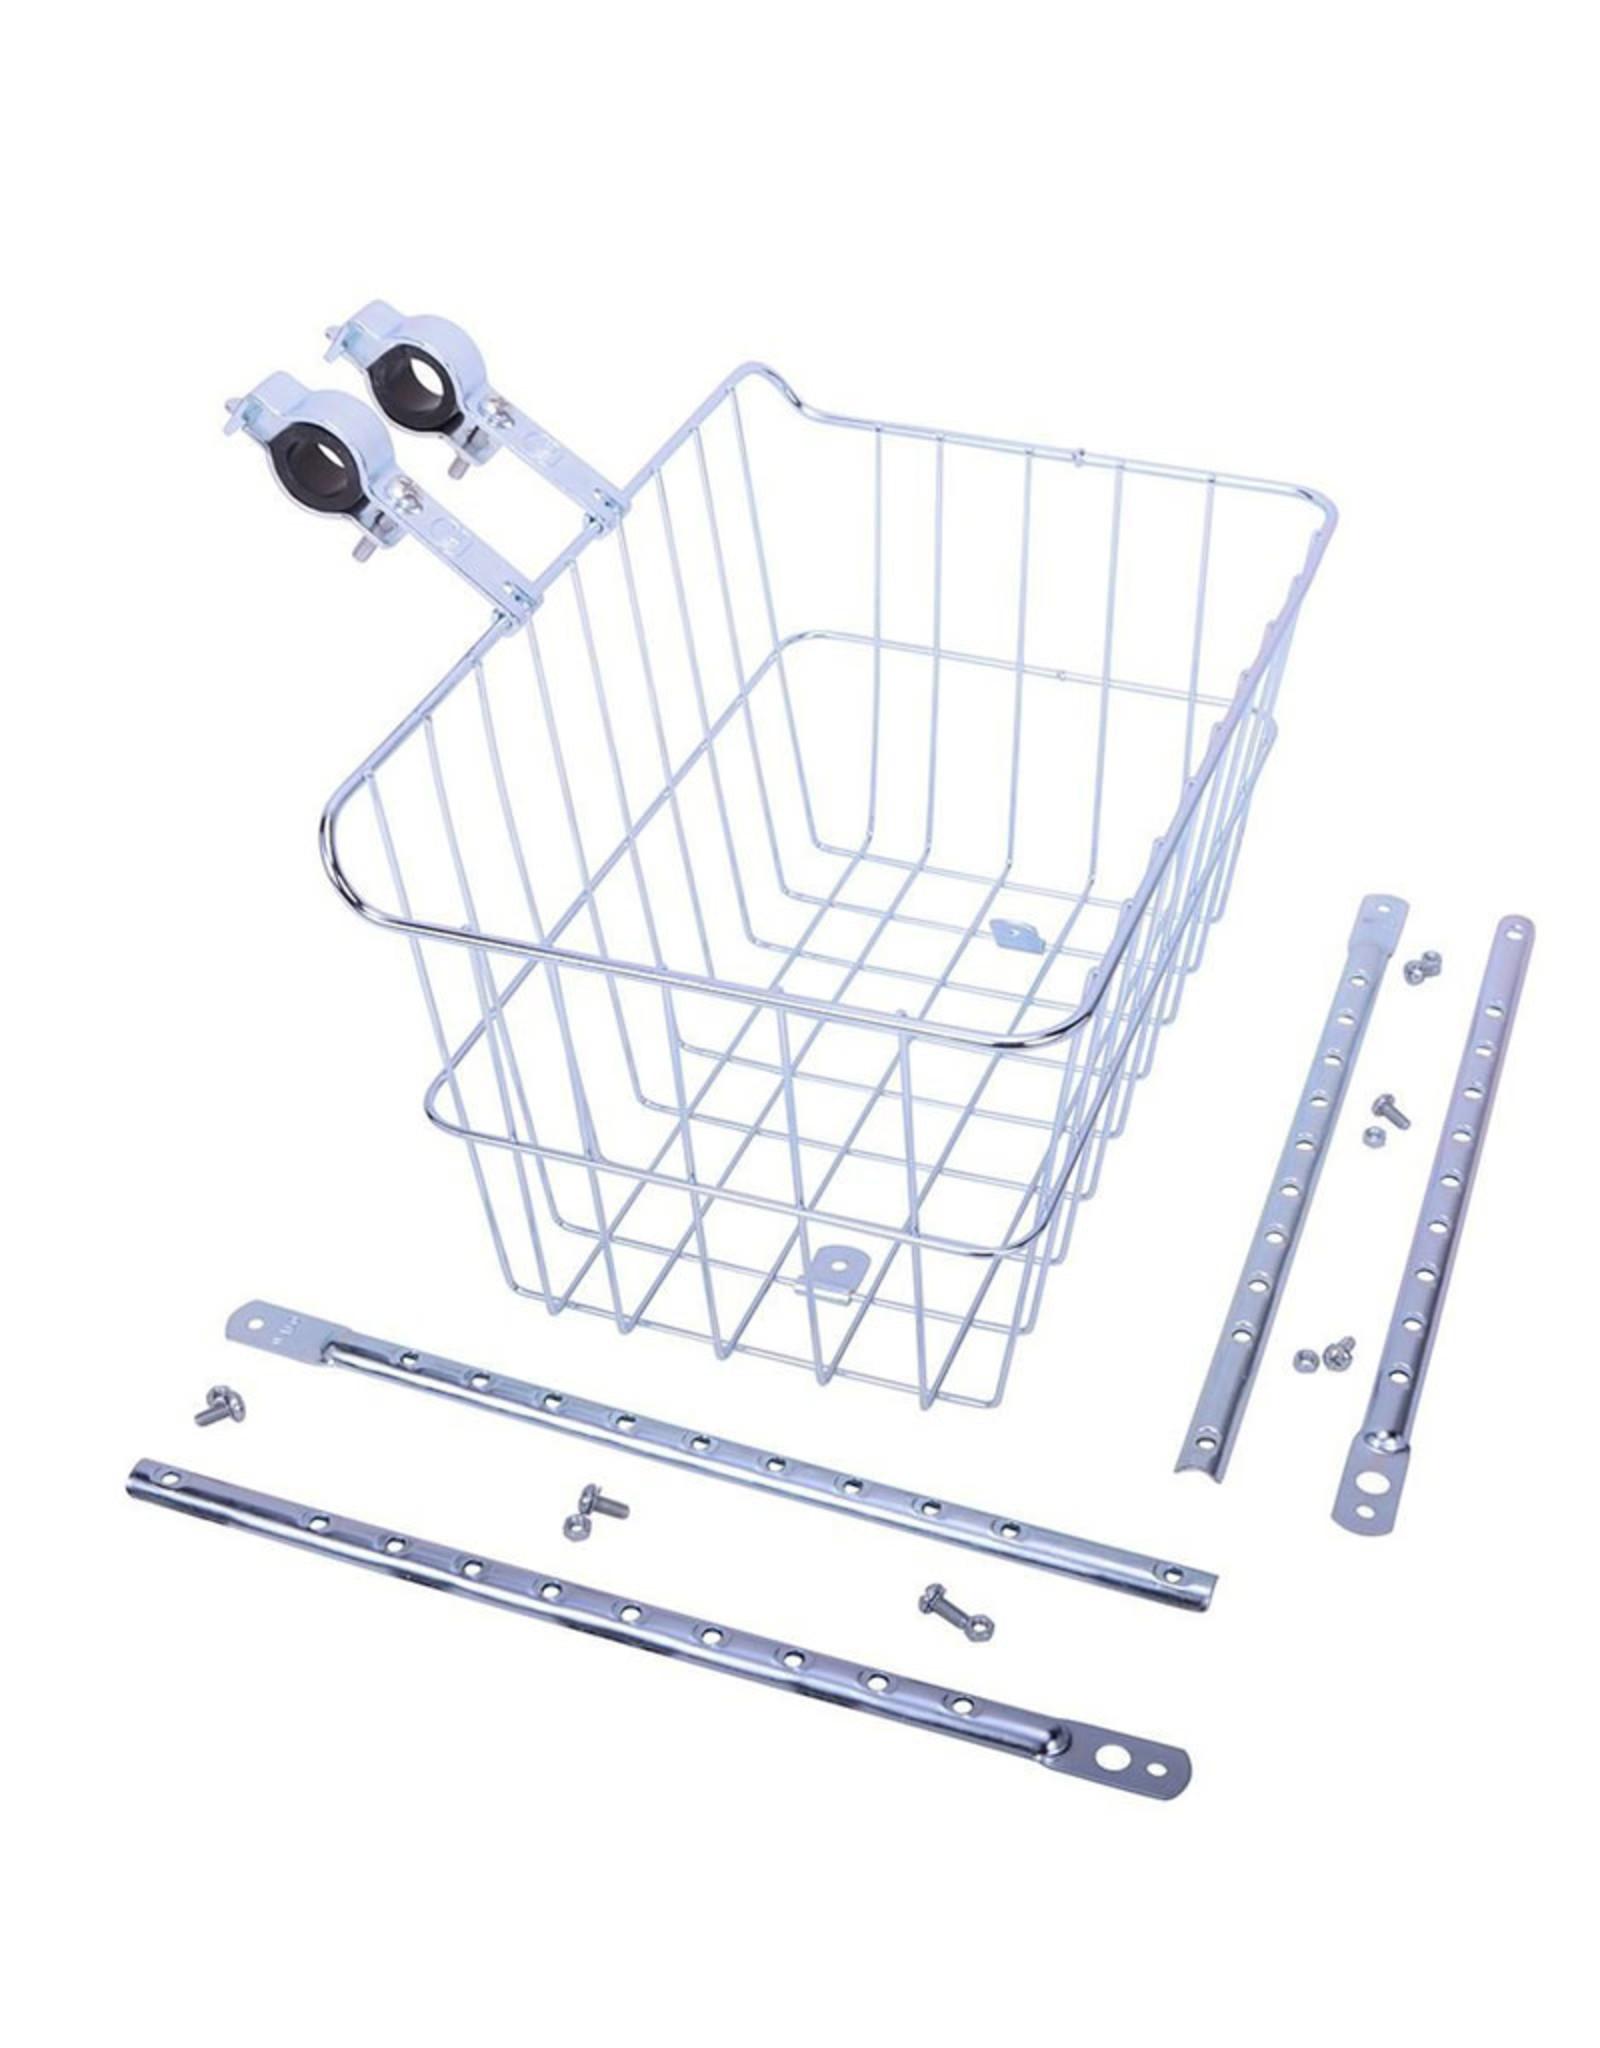 "Wald Basket, Front - Wald 1512, 14.5"" x 9"" x 7"", Multi-fit, Silver"